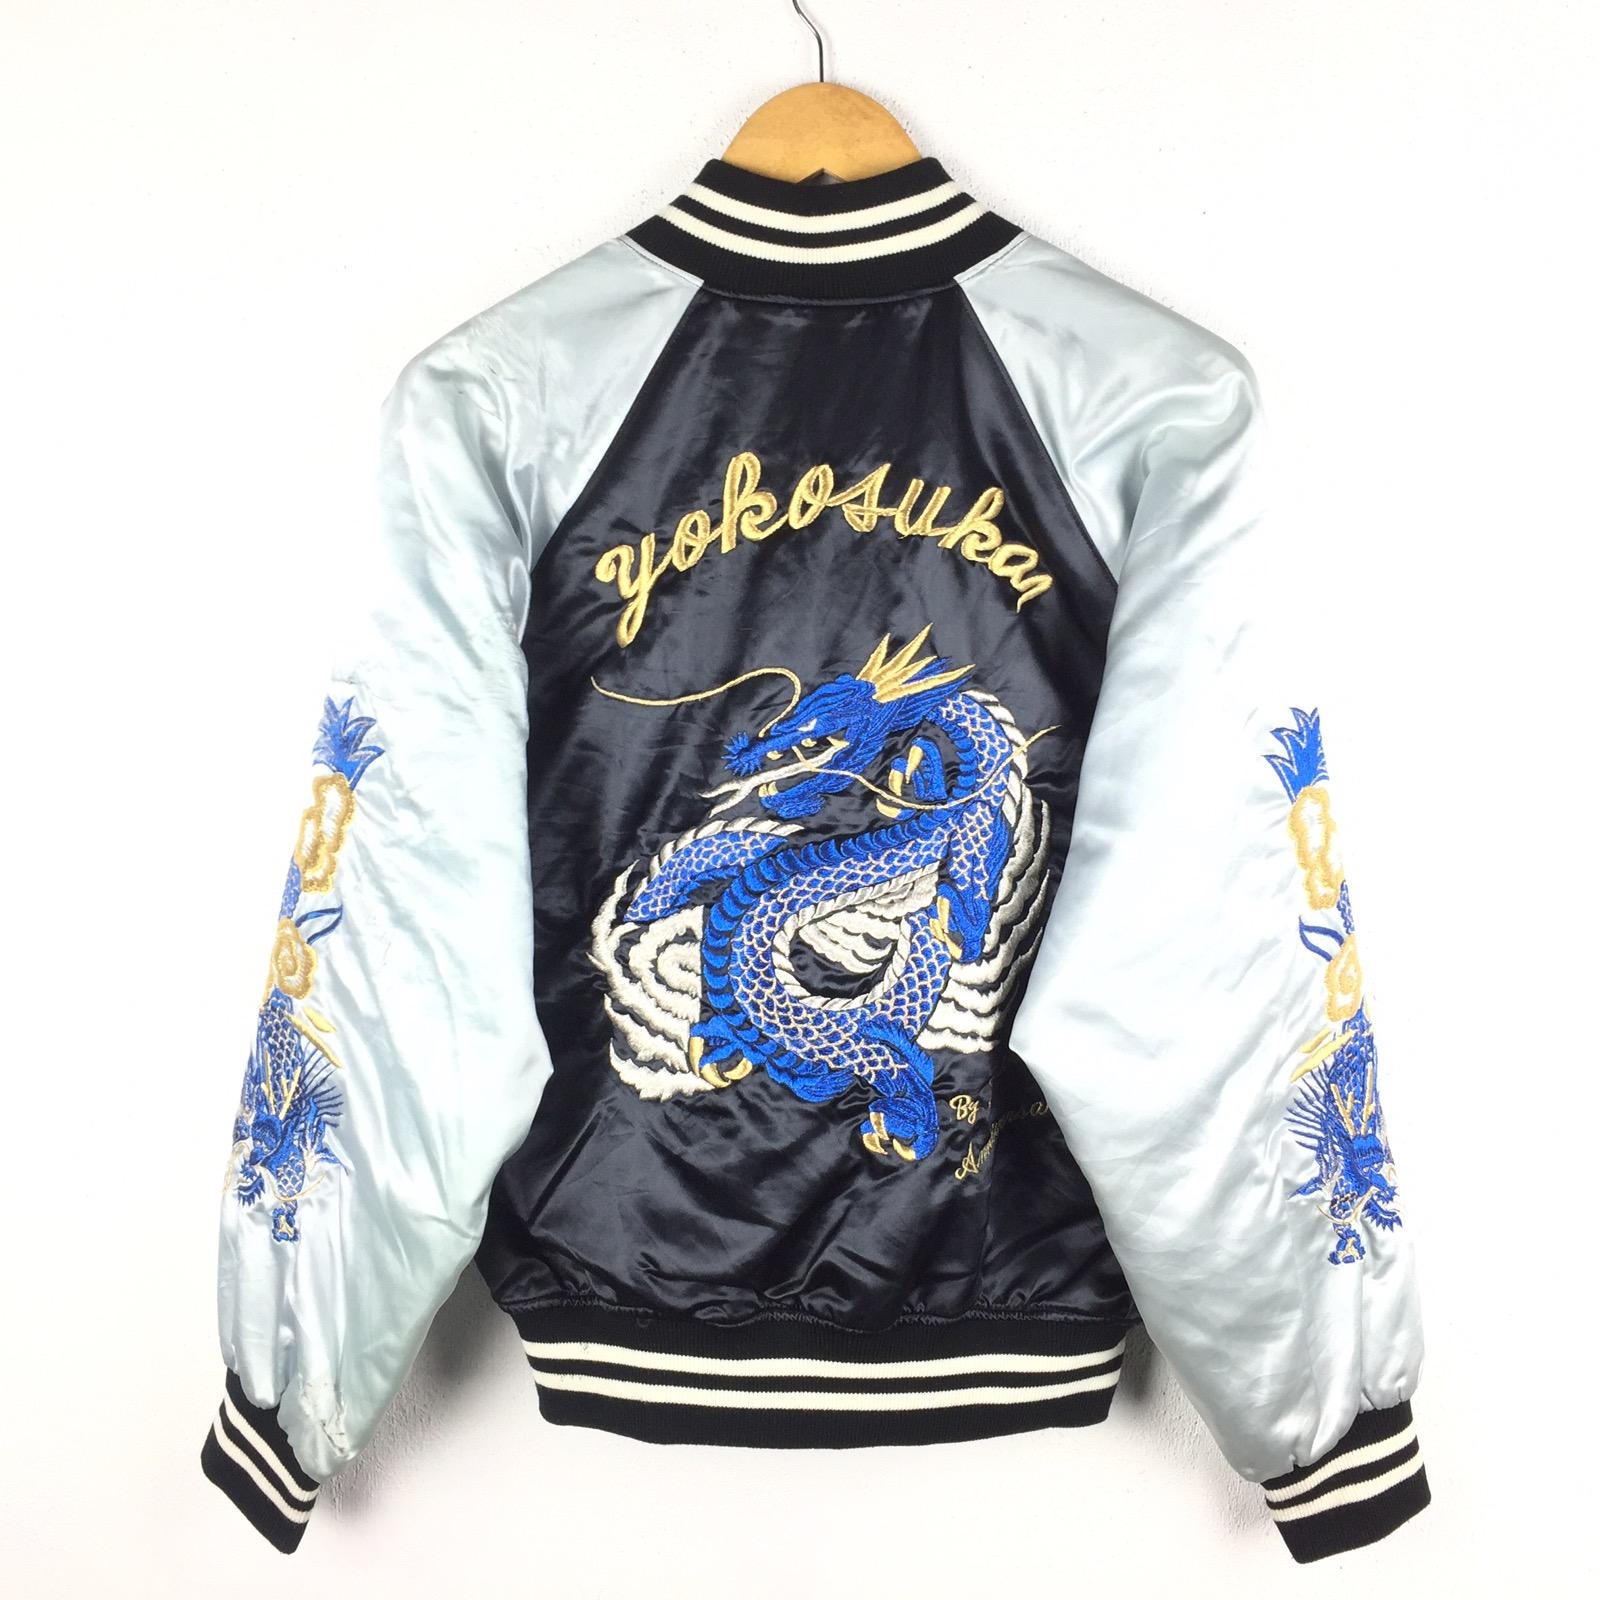 Vintage Sukajan Jacket JAPANESE TRADITIONAL Dragon Ryu Embroidery Japan Souvenir Tiger World War Yokosuka